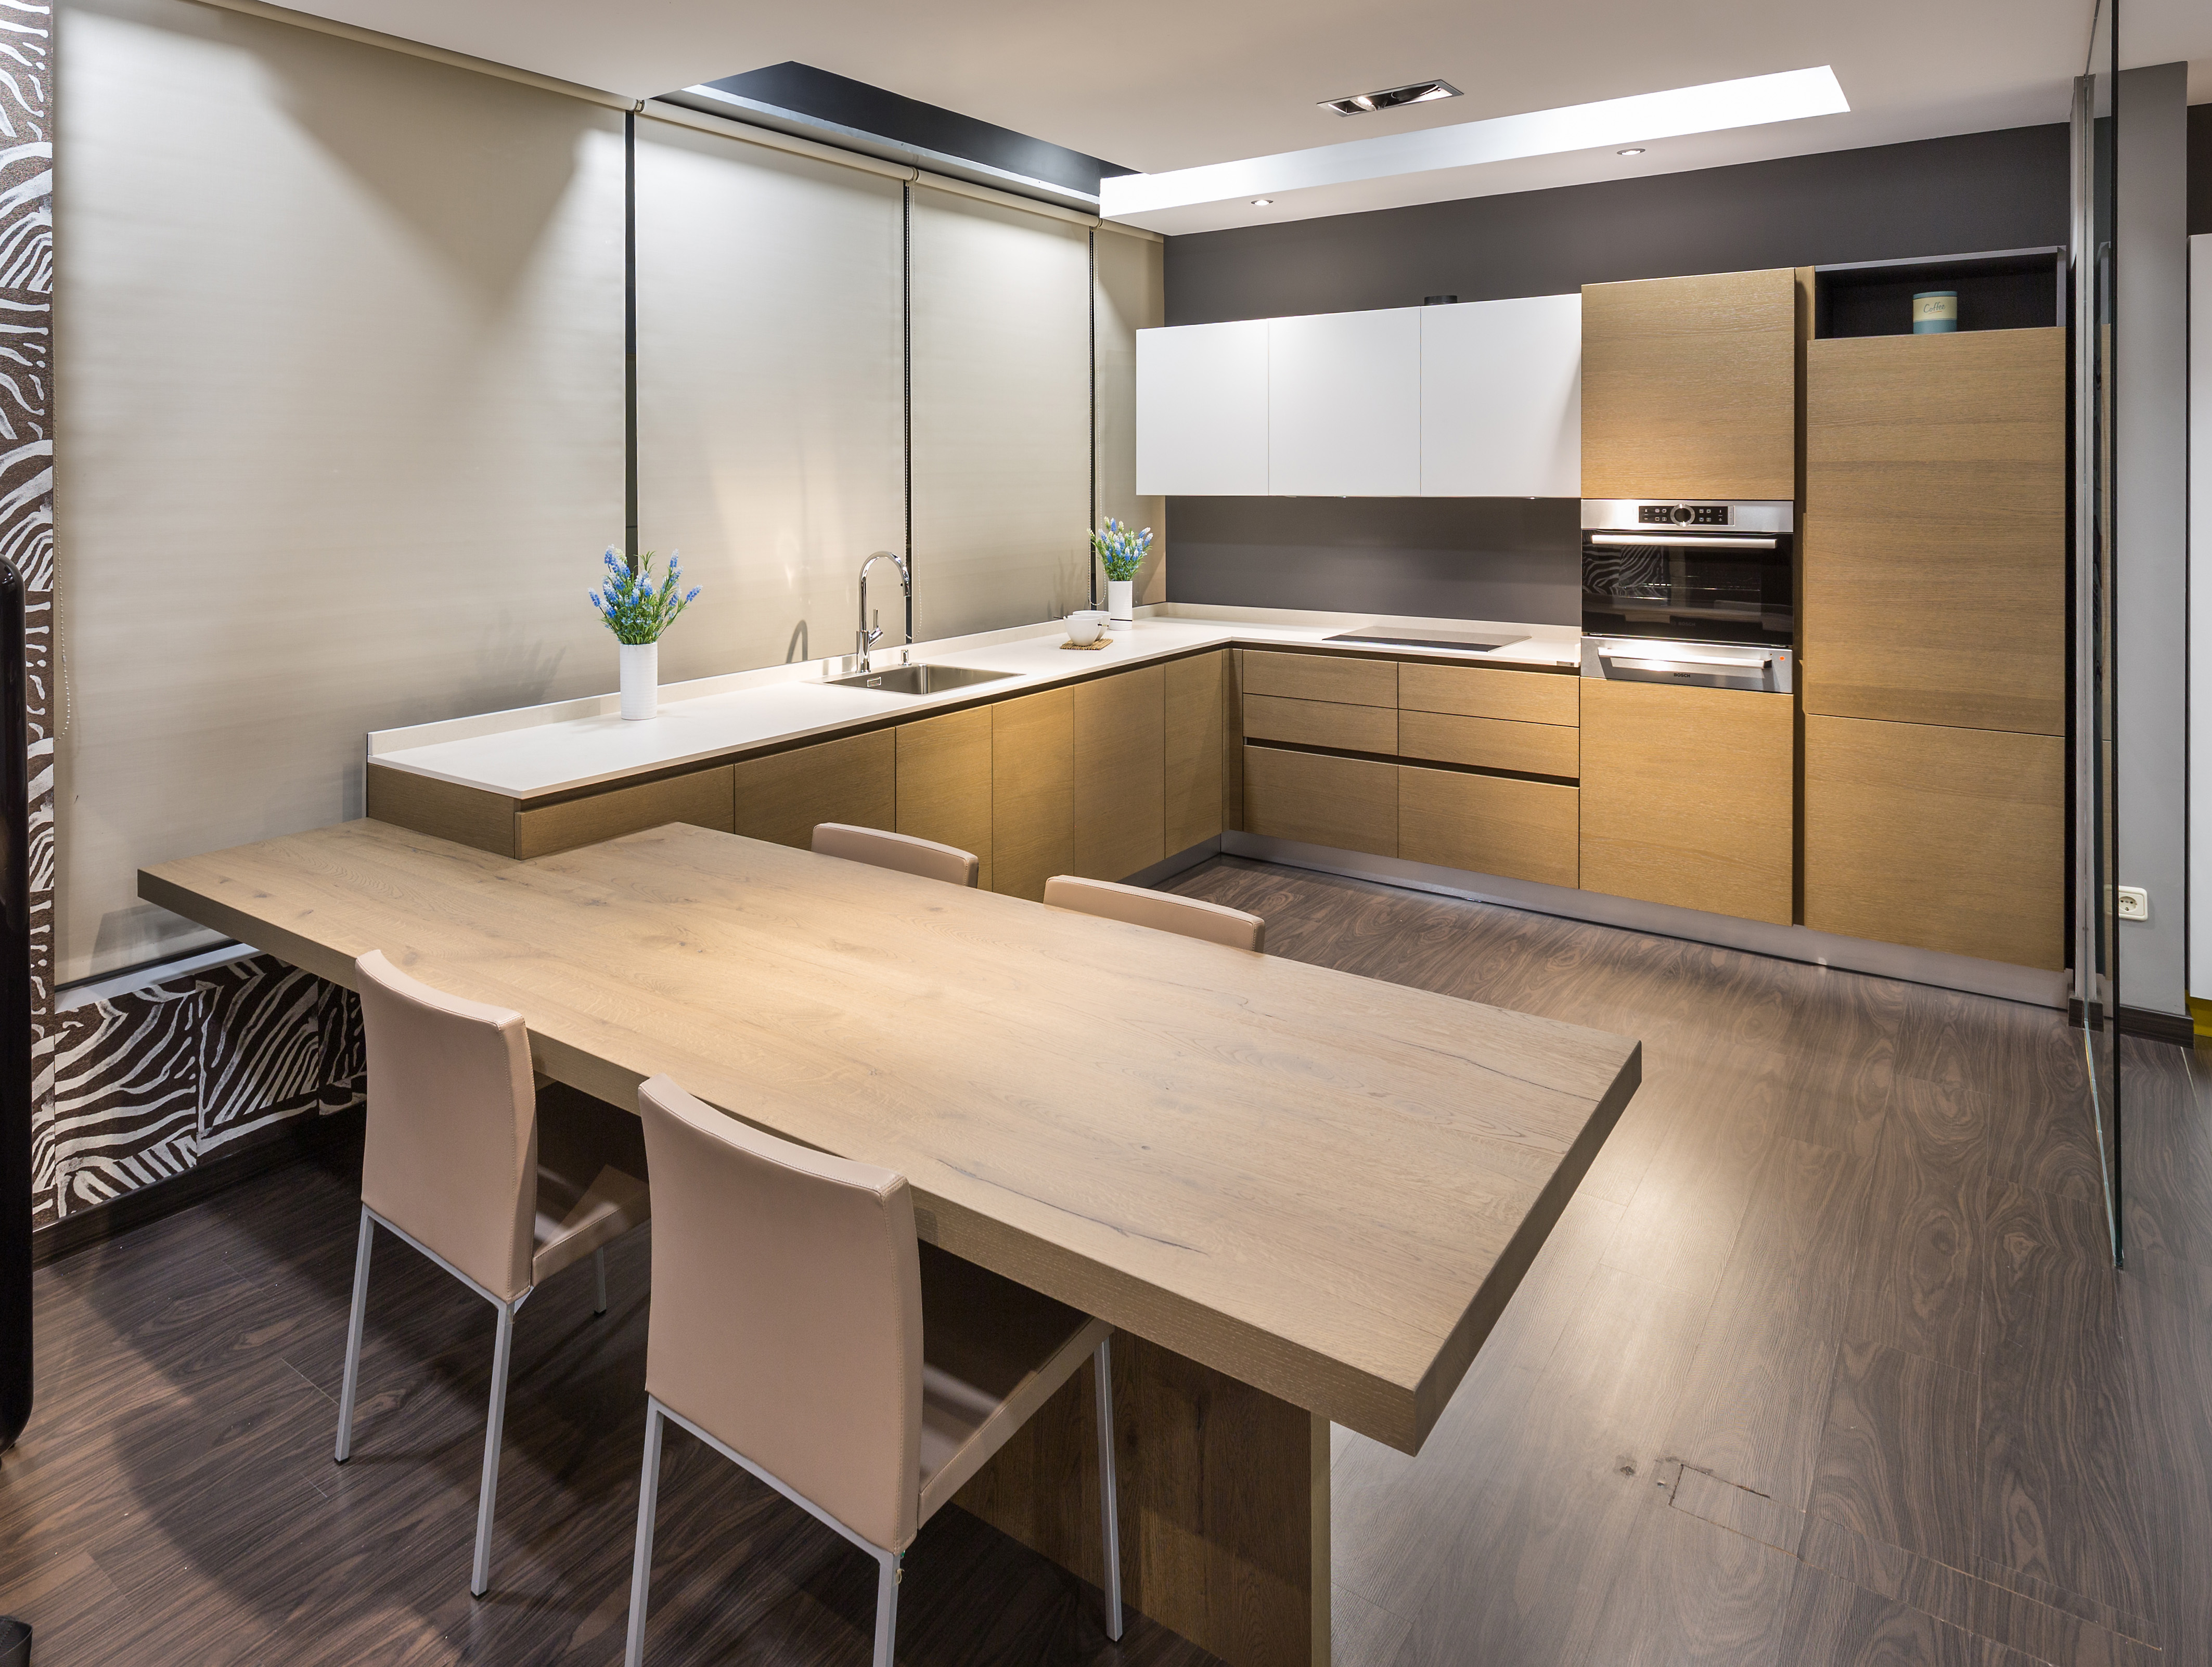 Las maderas pisan con fuerza cocinas rio for Modelo de cocina 2016